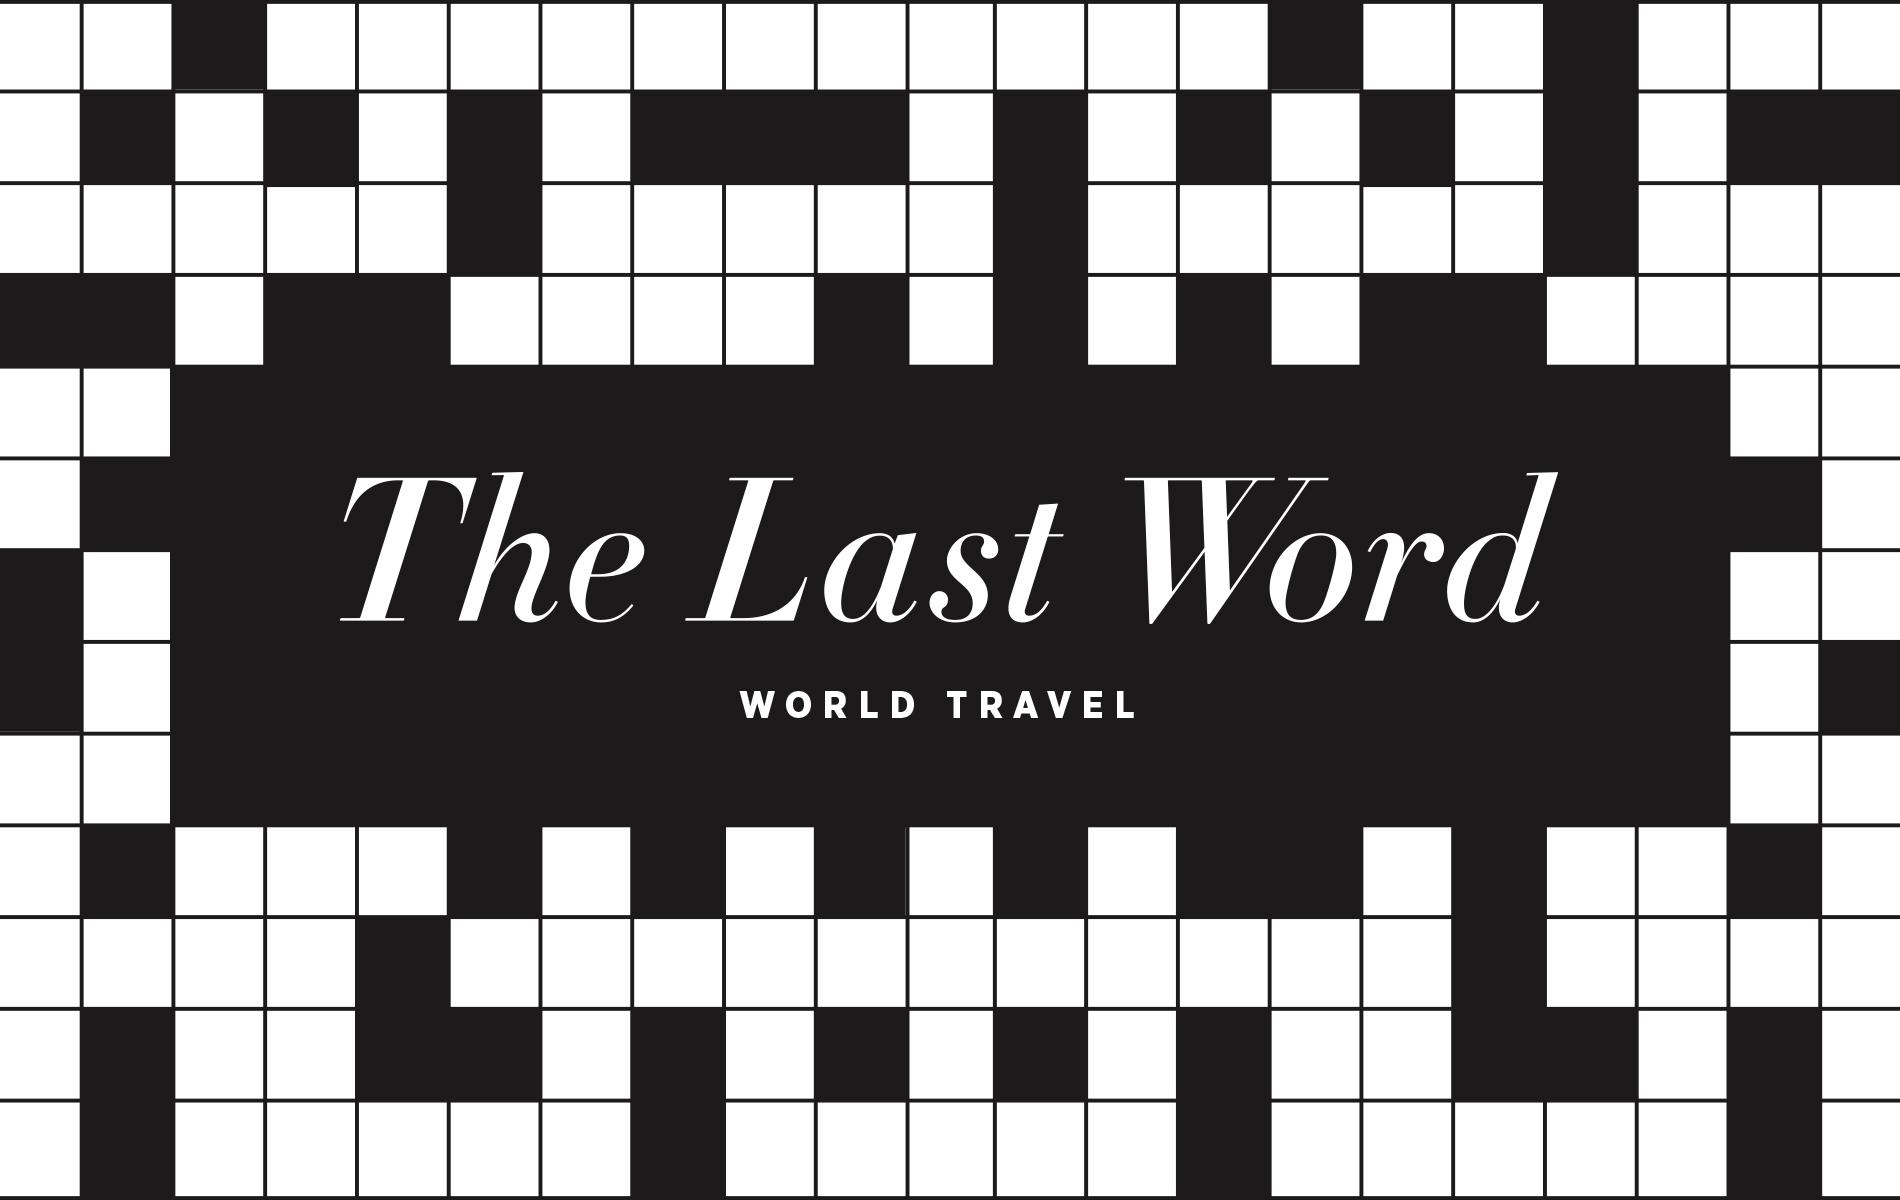 VIE Magazine January 2020 Travel Issue Crossword Puzzle